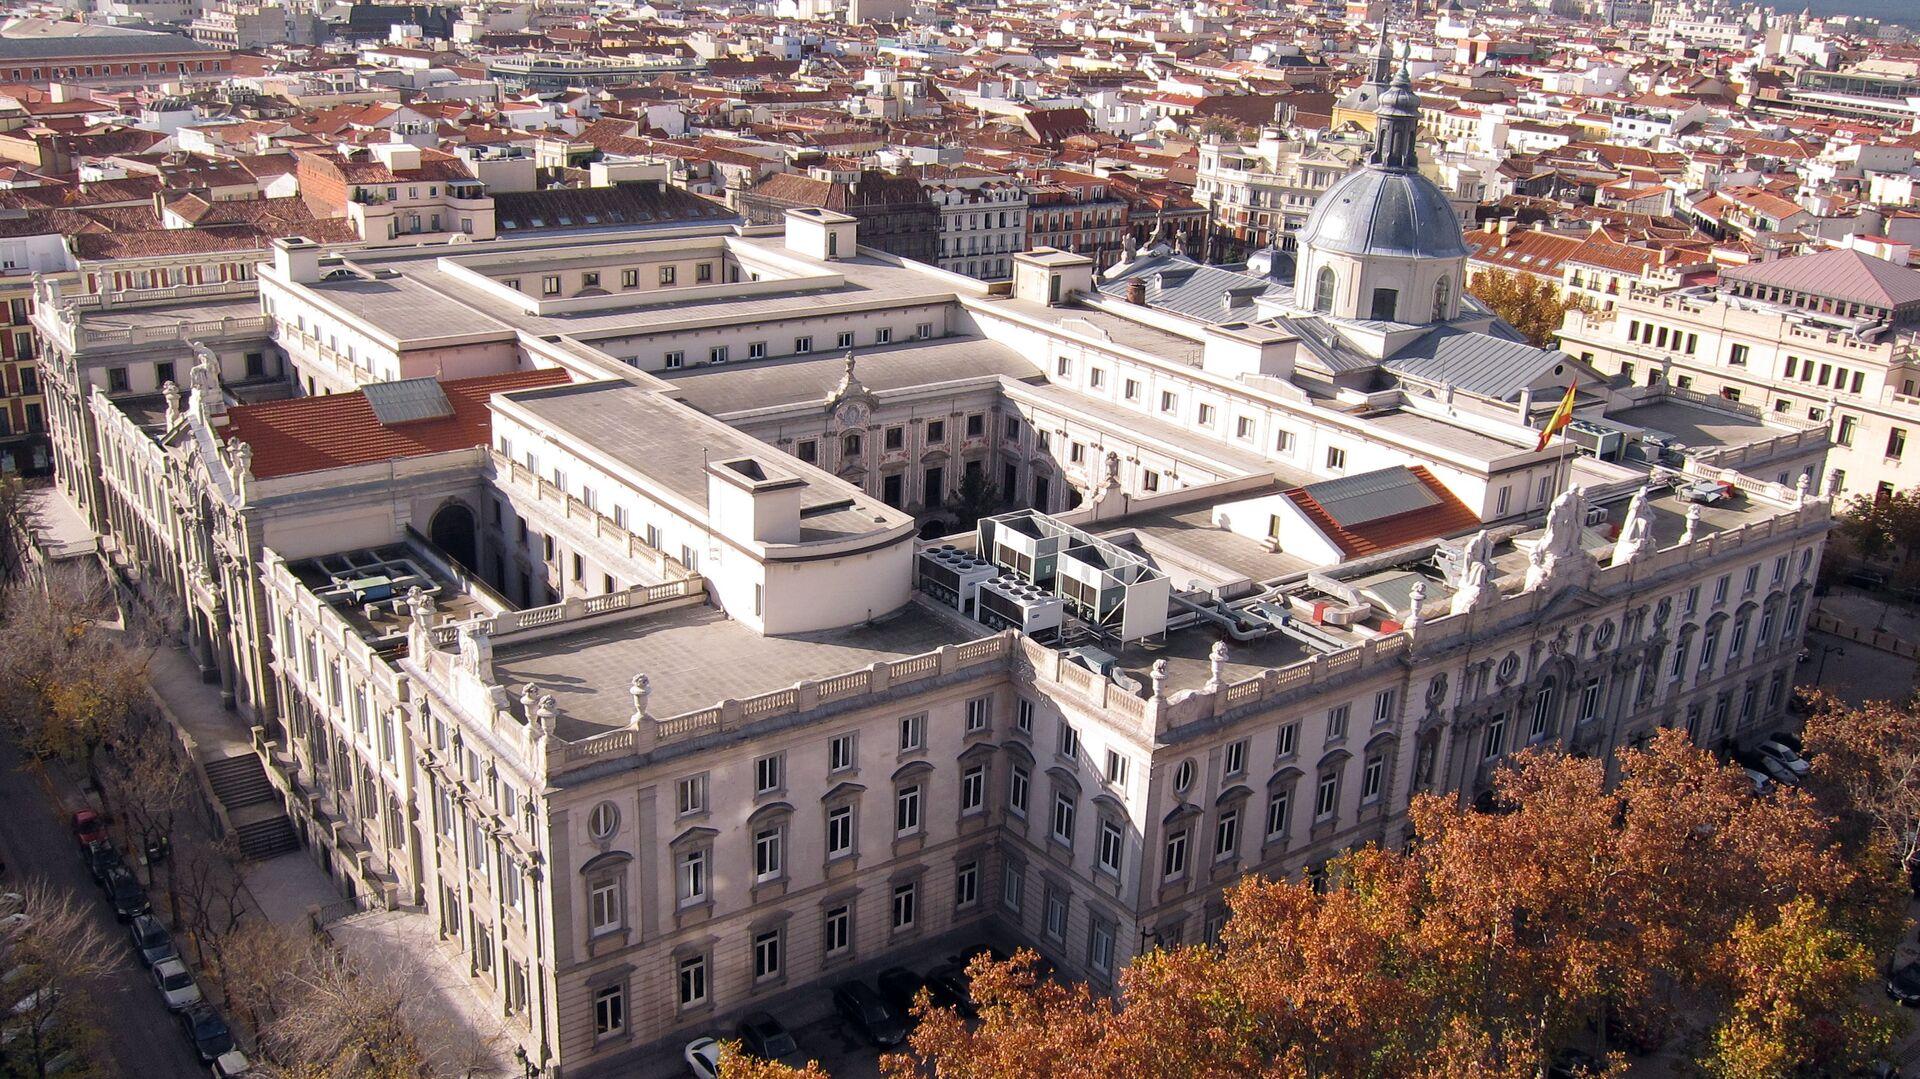 Tribunal Supremo de España en Madrid (vista aérea) - Sputnik Mundo, 1920, 30.09.2021